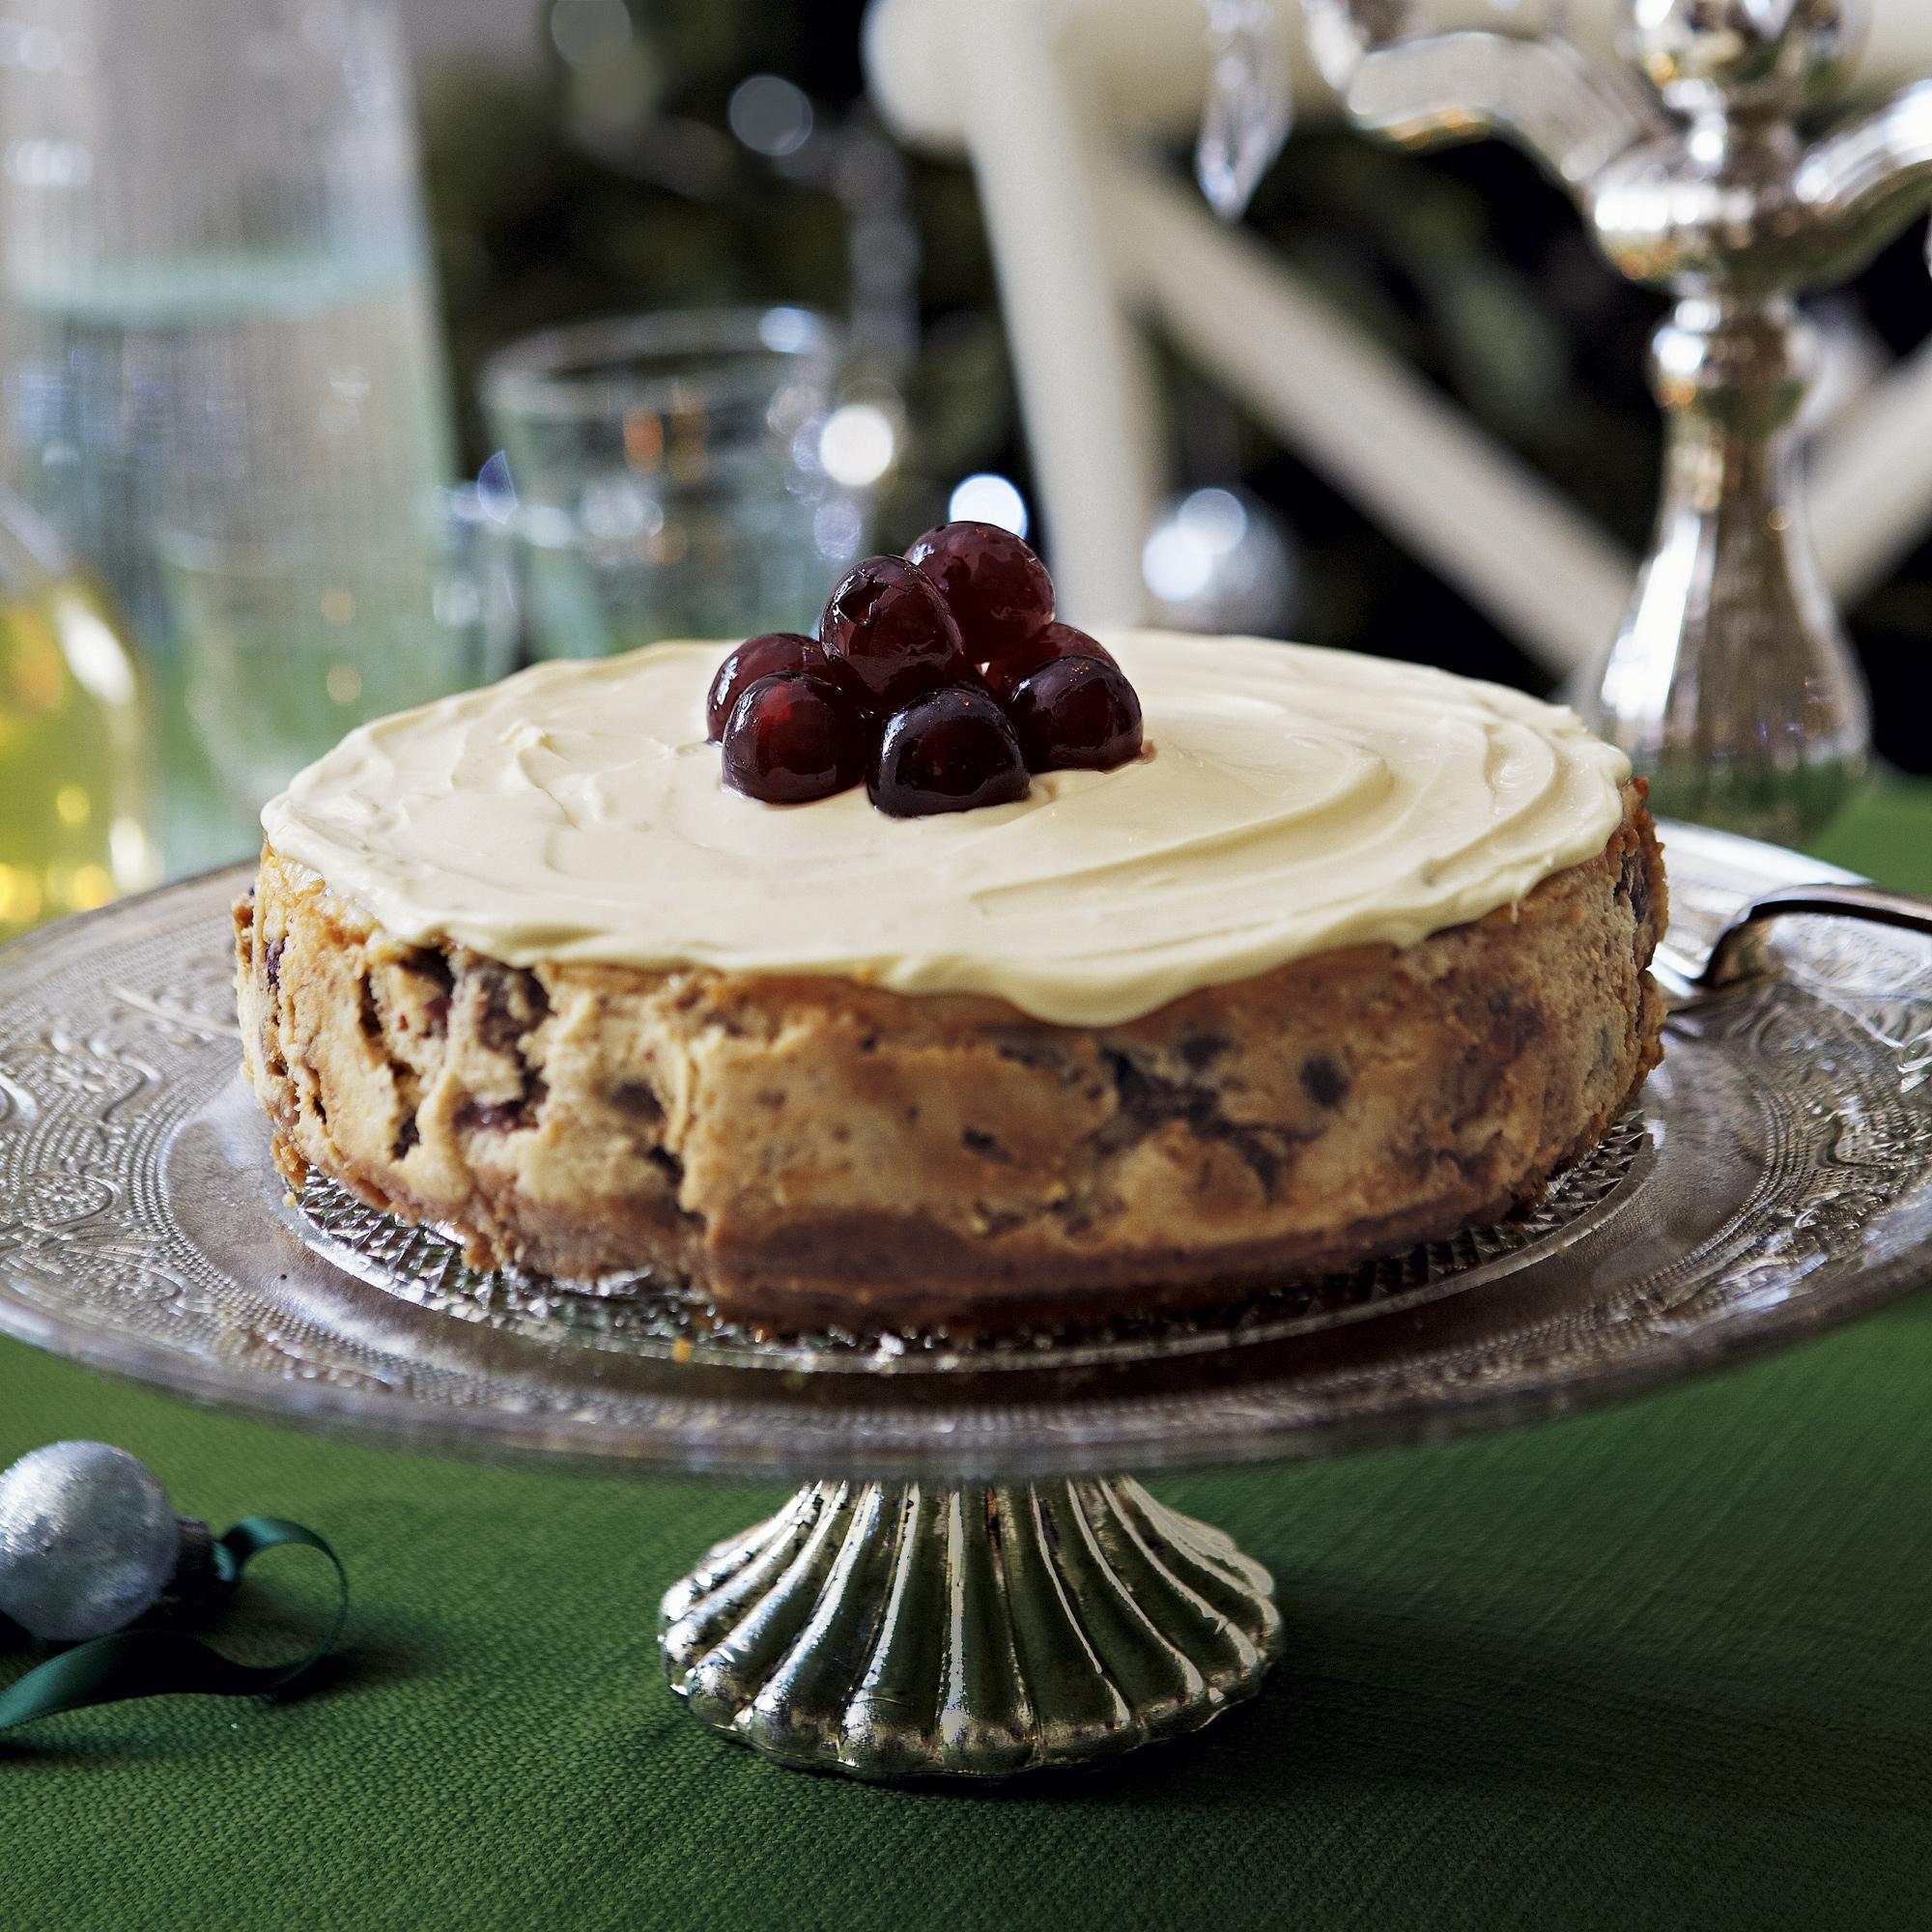 Christmas Cheesecake.Christmas Cheesecake With Soaked Fruits